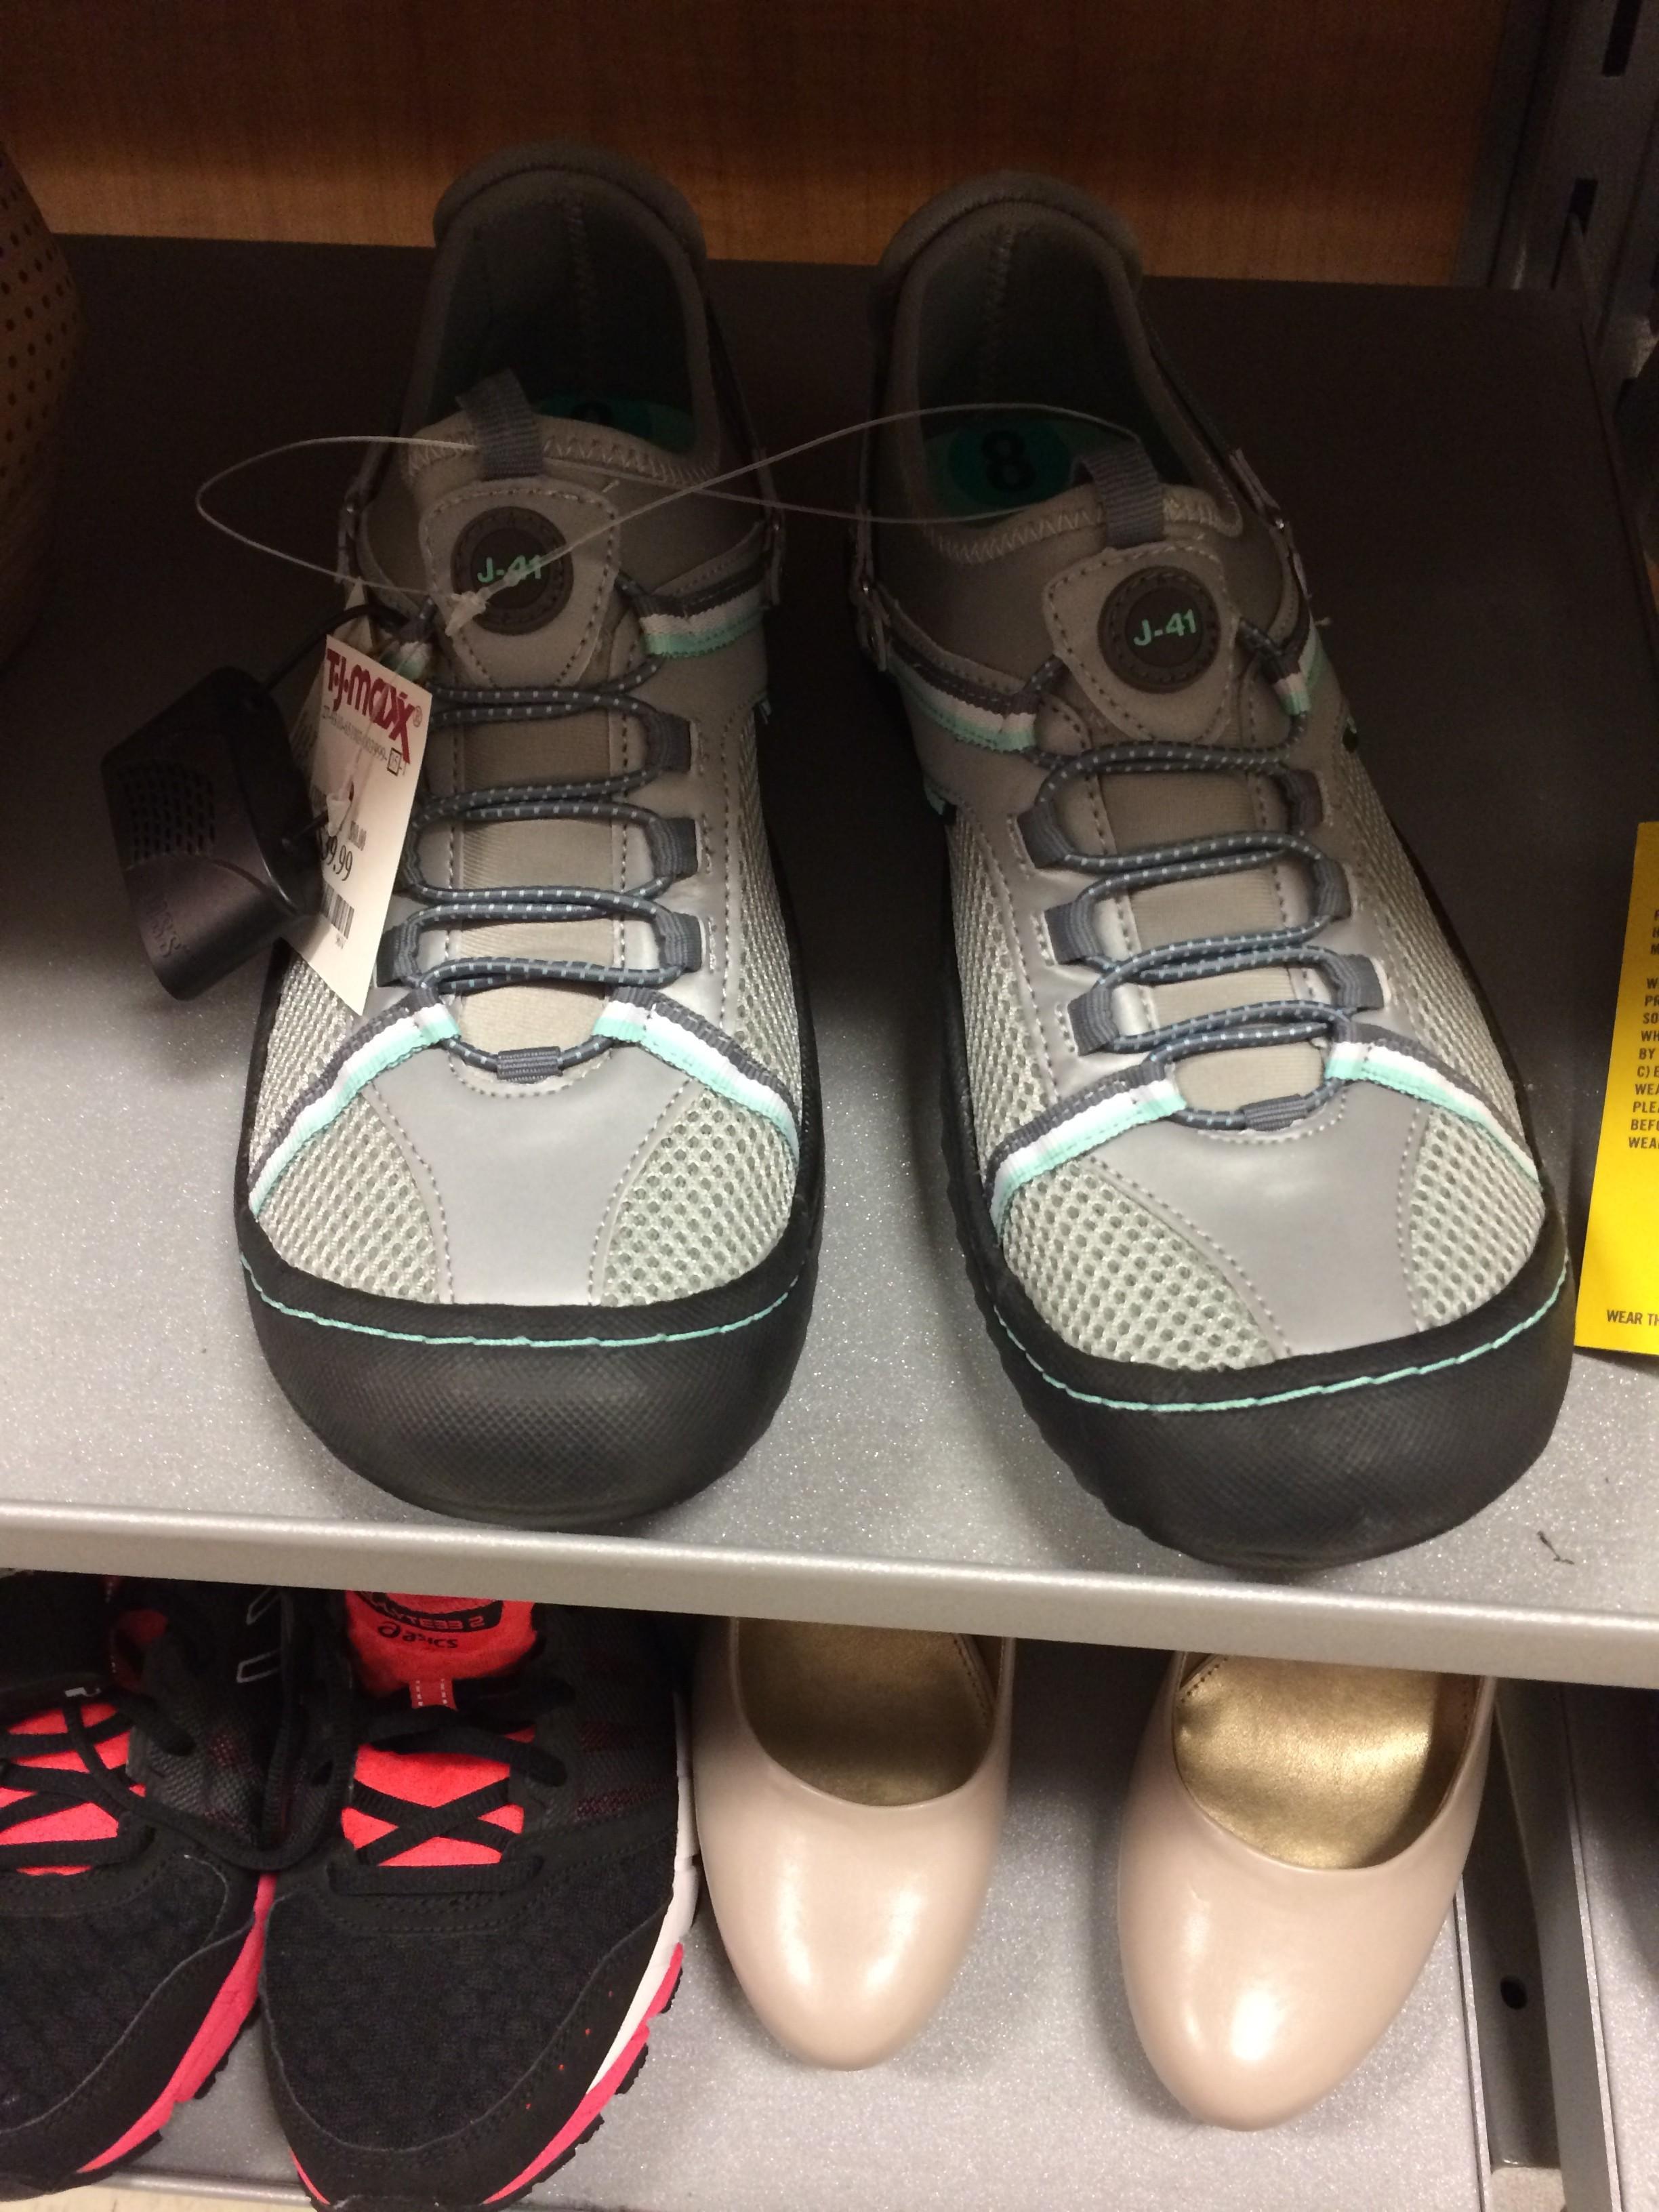 Jeep tennis shoes via for Tj maxx jewelry box